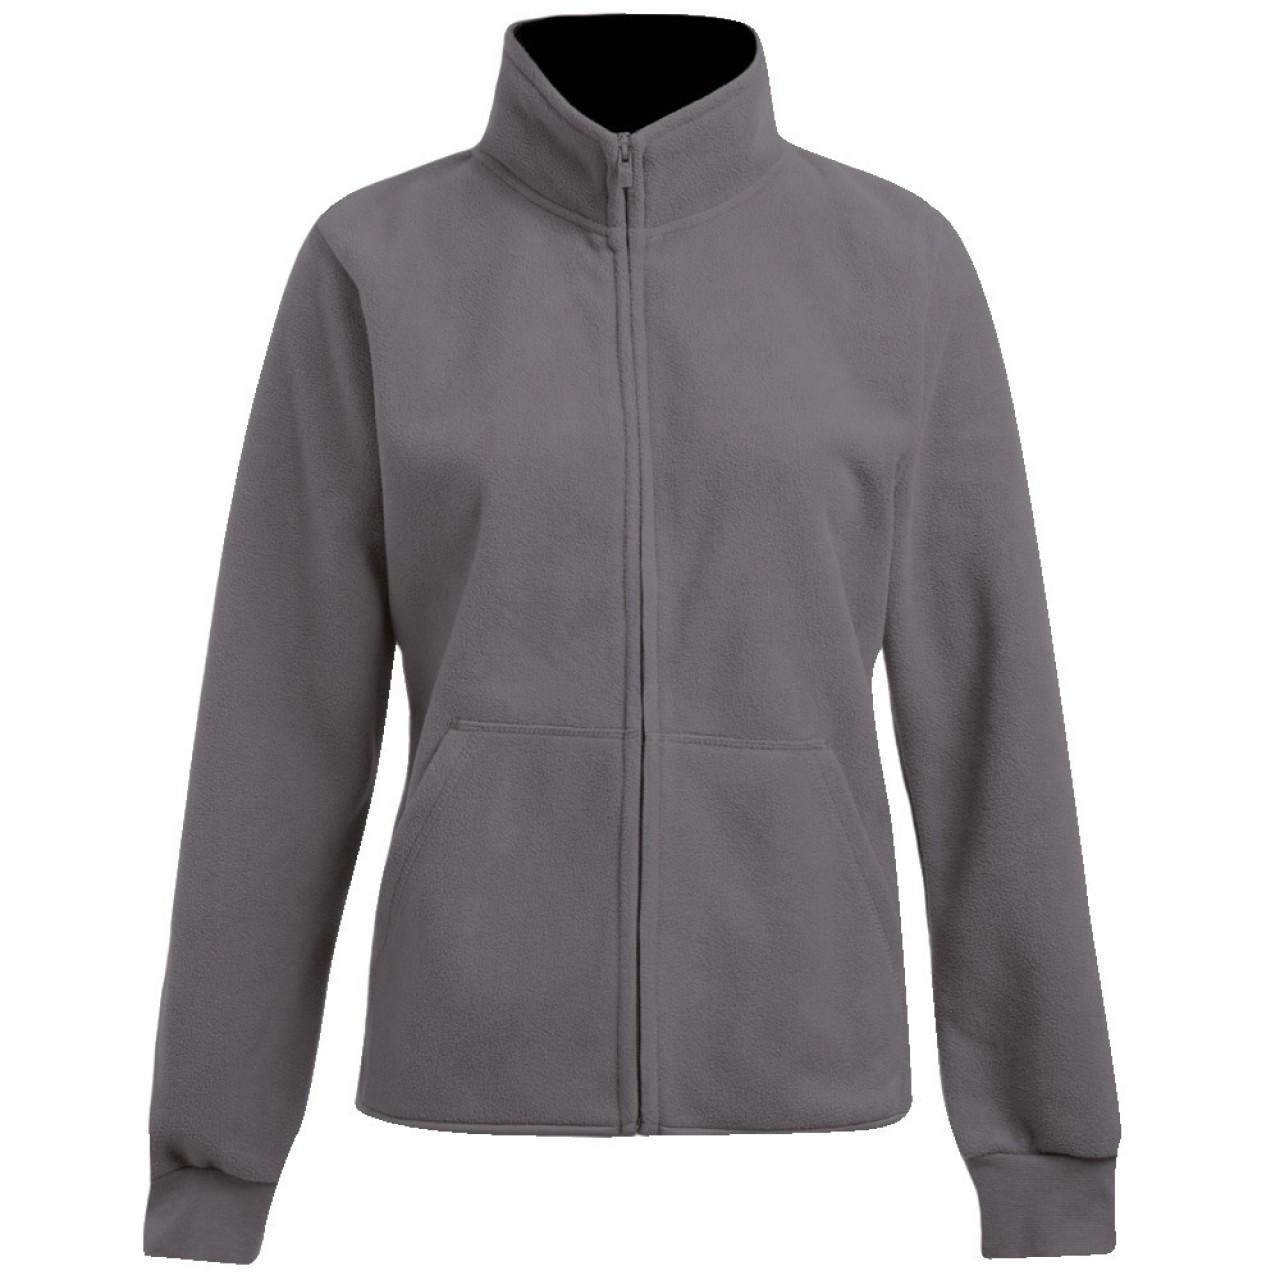 Damen Fleece Jacke grau/schwarz